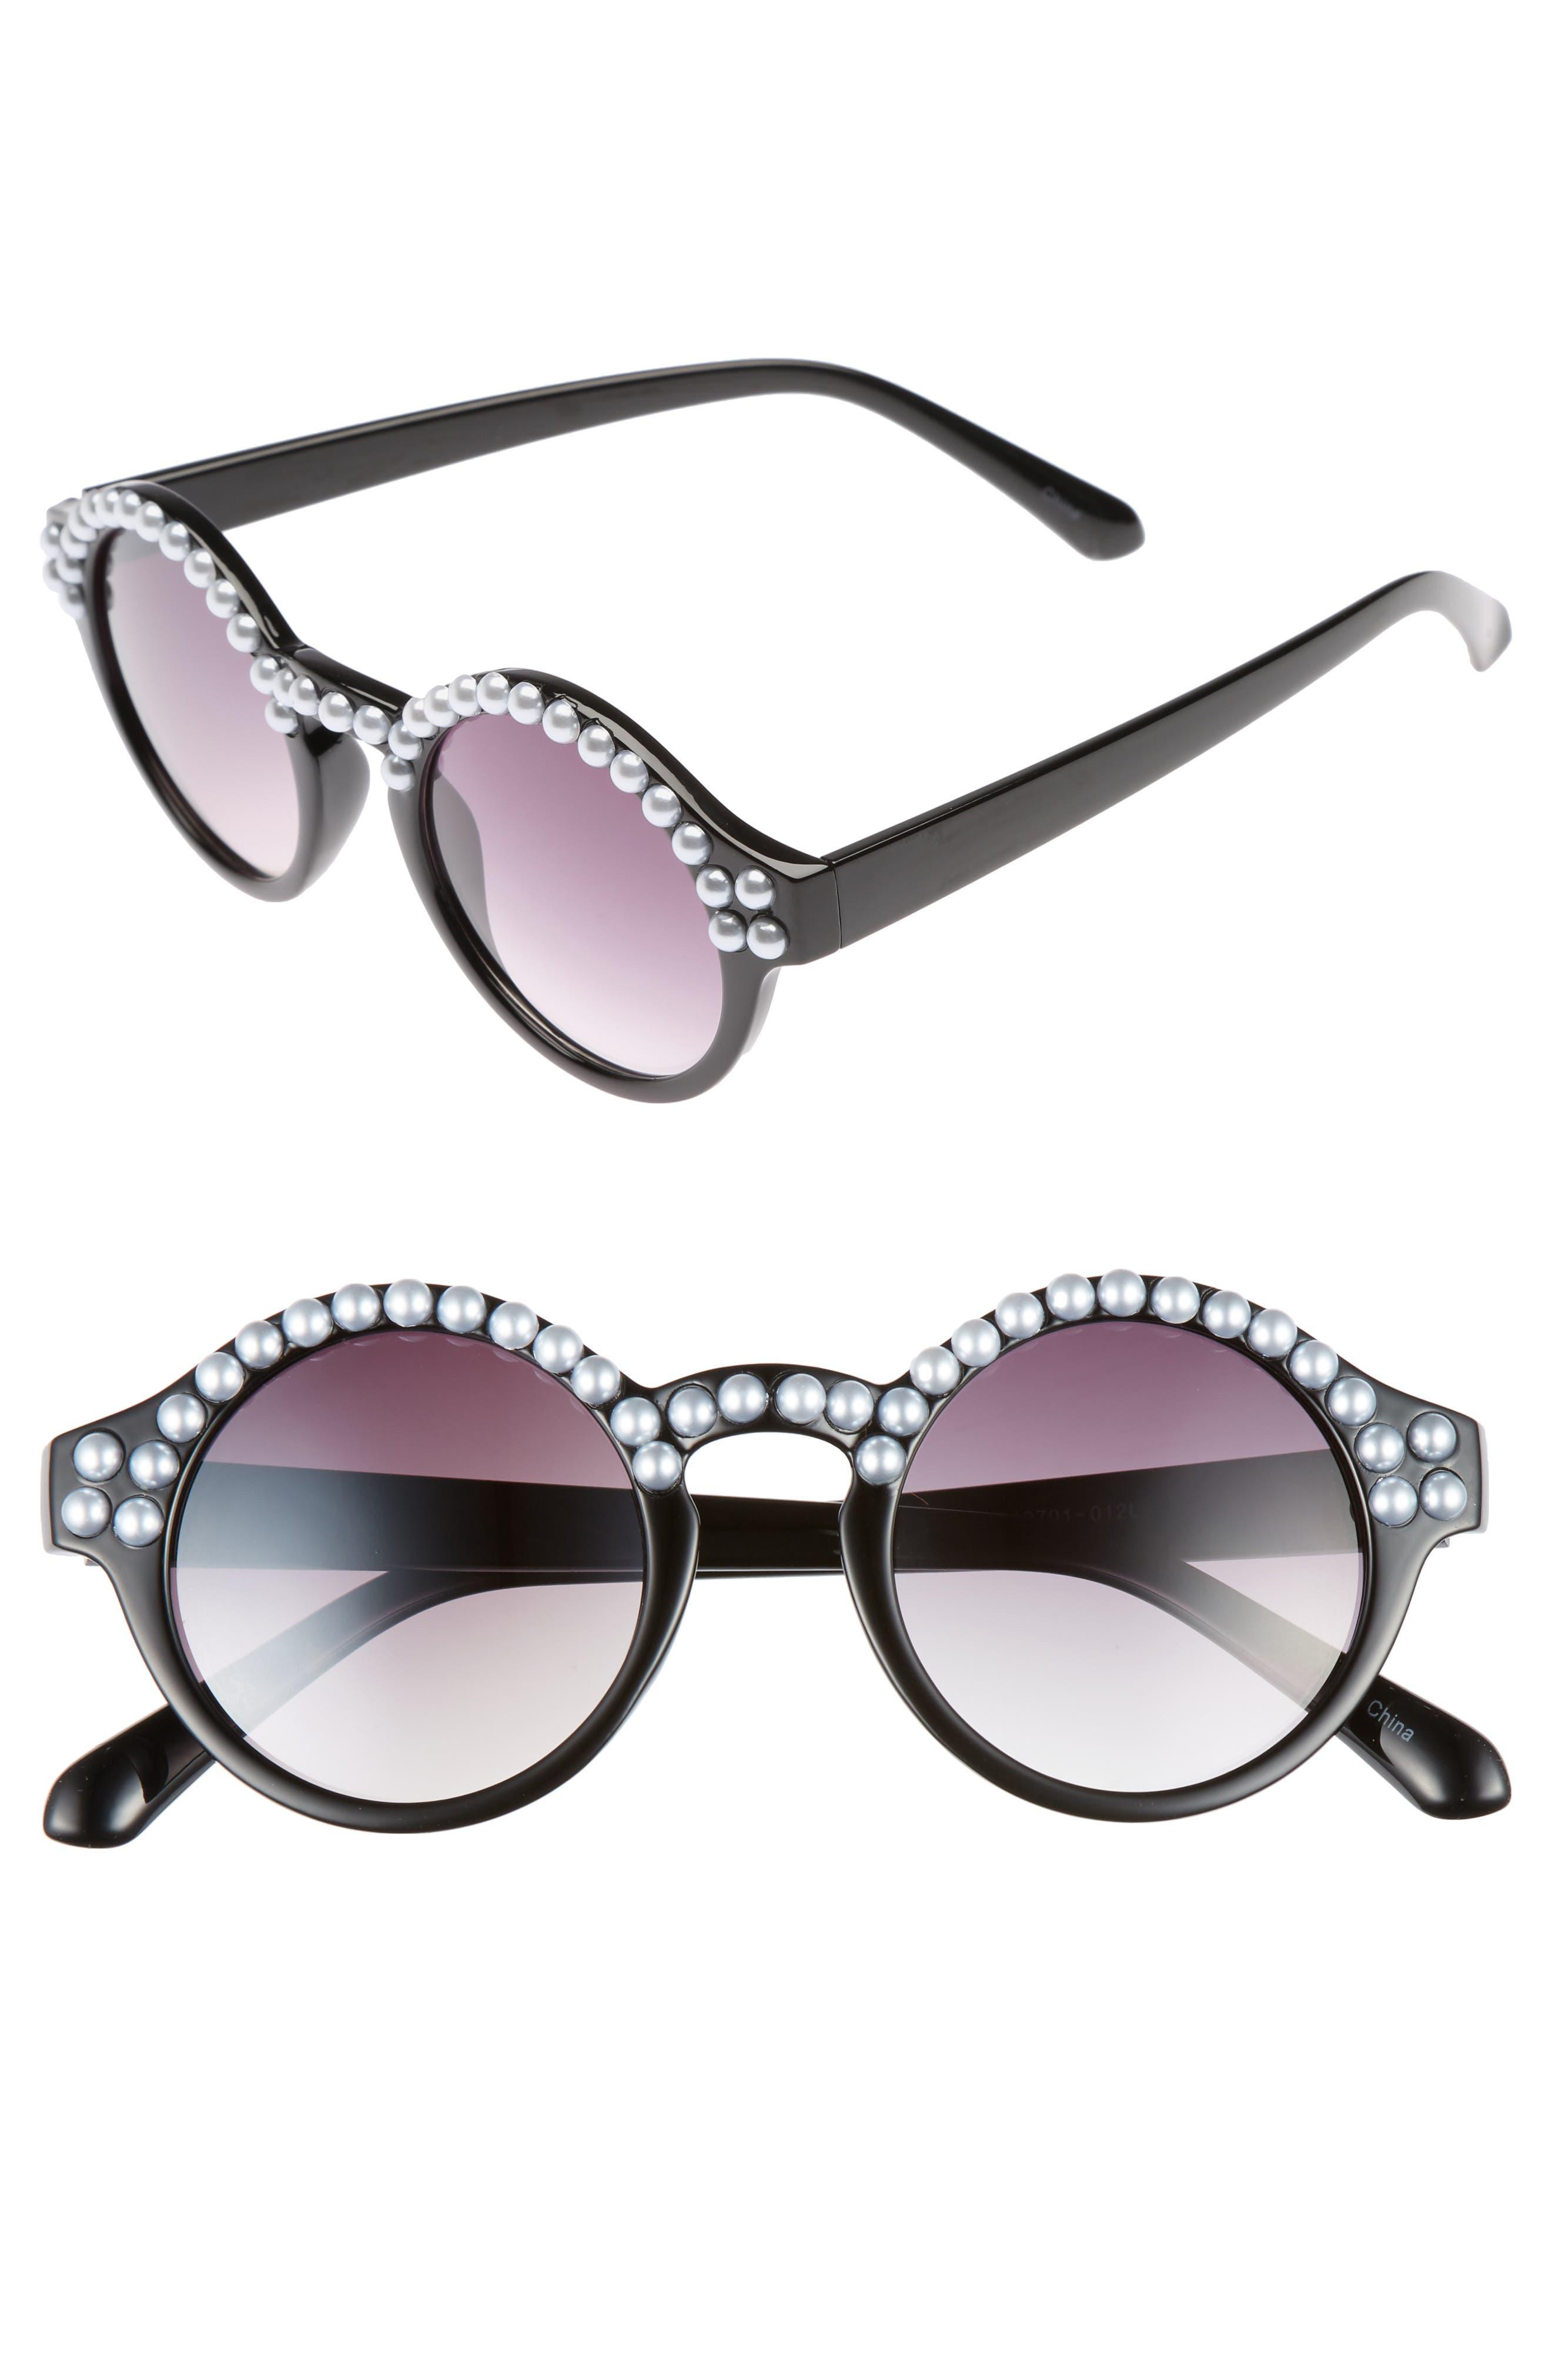 45mm Imitation Pearl Round Sunglasses,                         Main,                         color, 002